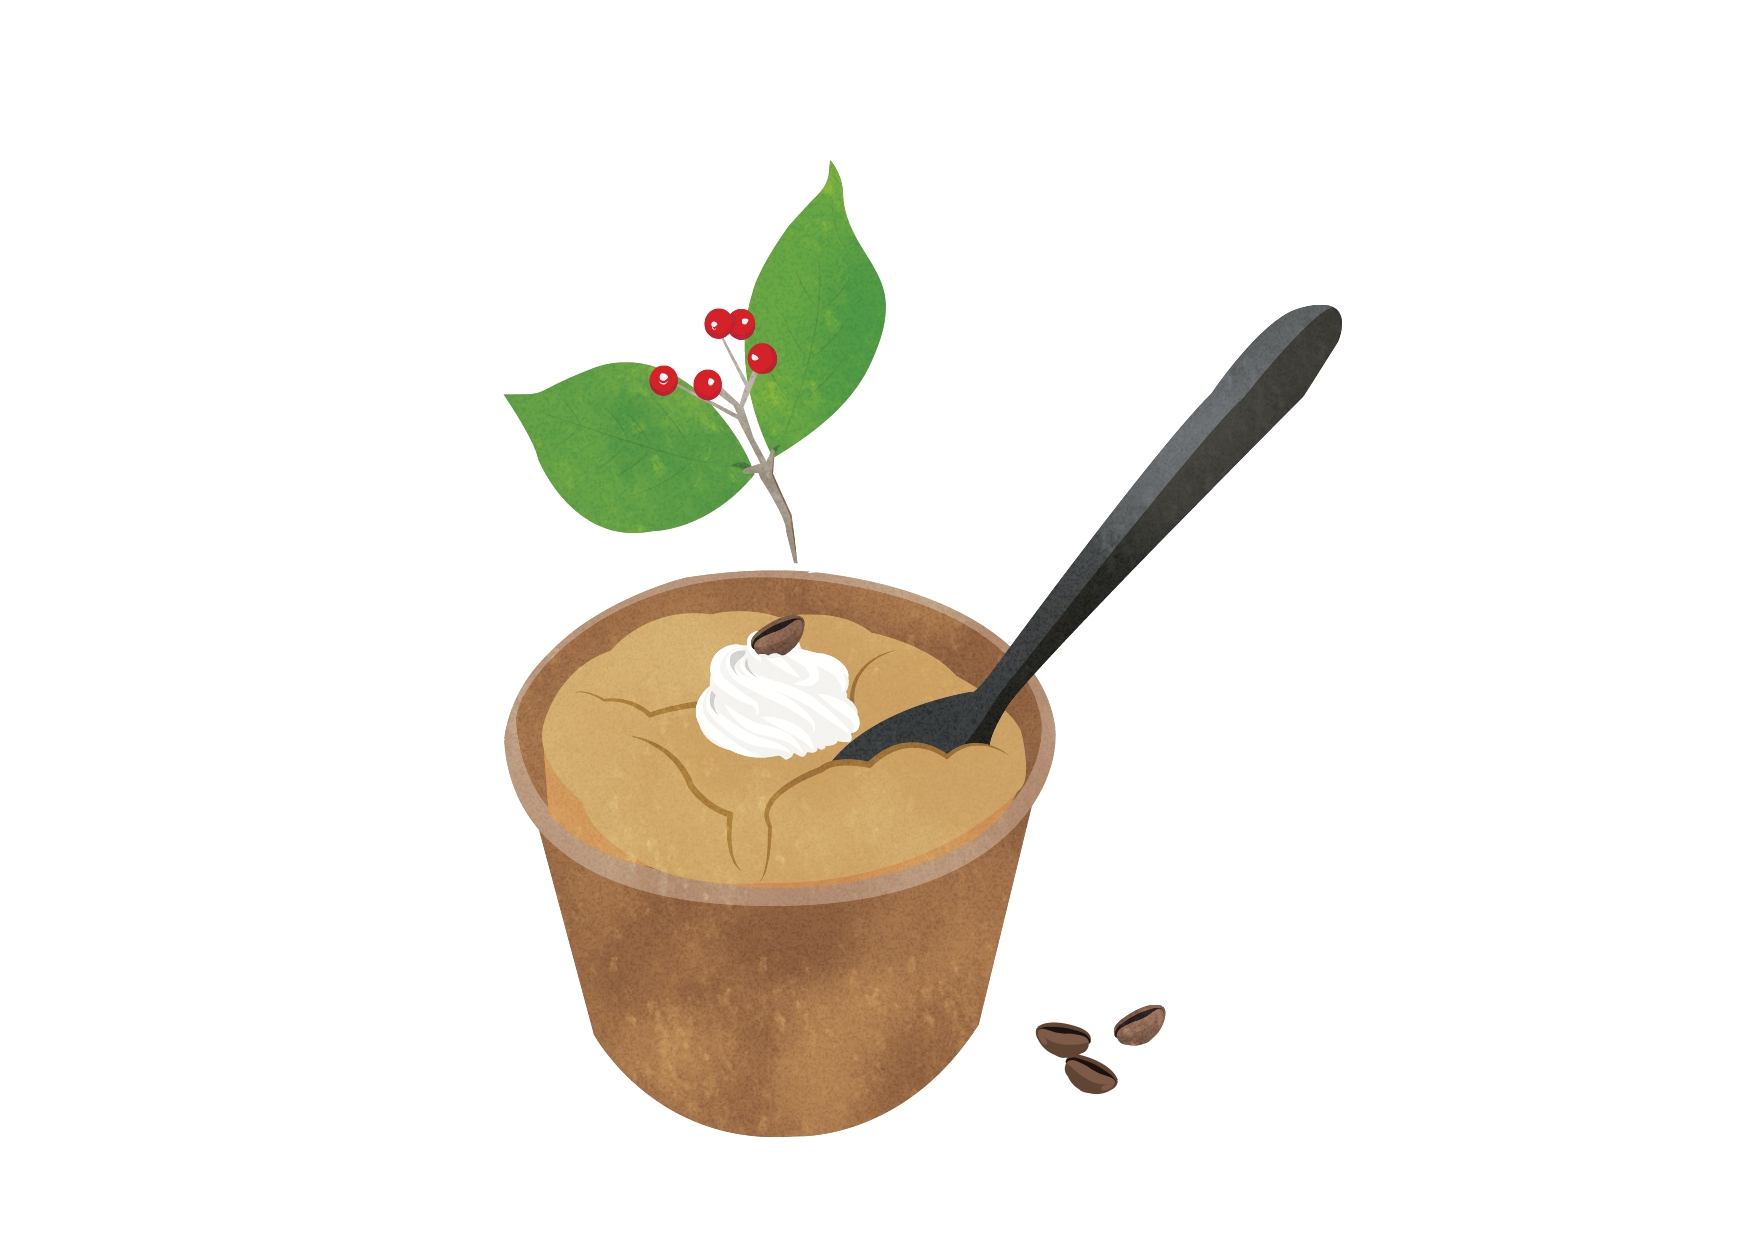 "【RENO CAFE SWEETSレシピ】No.3 ‶DANDAN"" 『Chiffon in Espresso』"